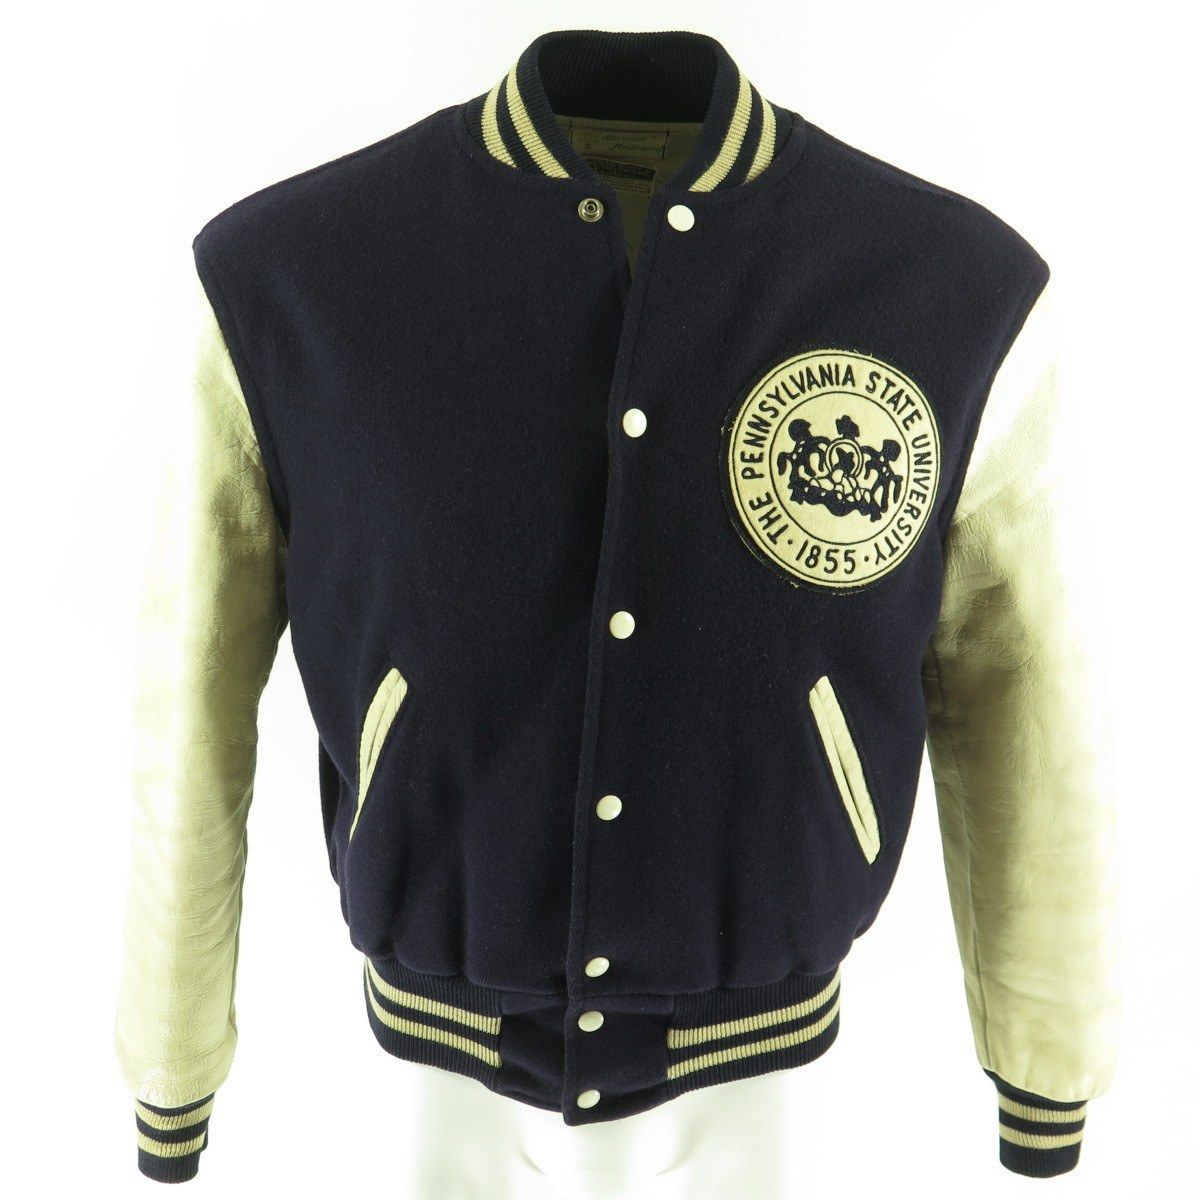 Vintage 60s Penn State Varsity Letterman Jacket Mens 40 Holloway Wool Leather The Clothing Vault Varsity Letterman Jackets Letterman Jacket Mens Jackets